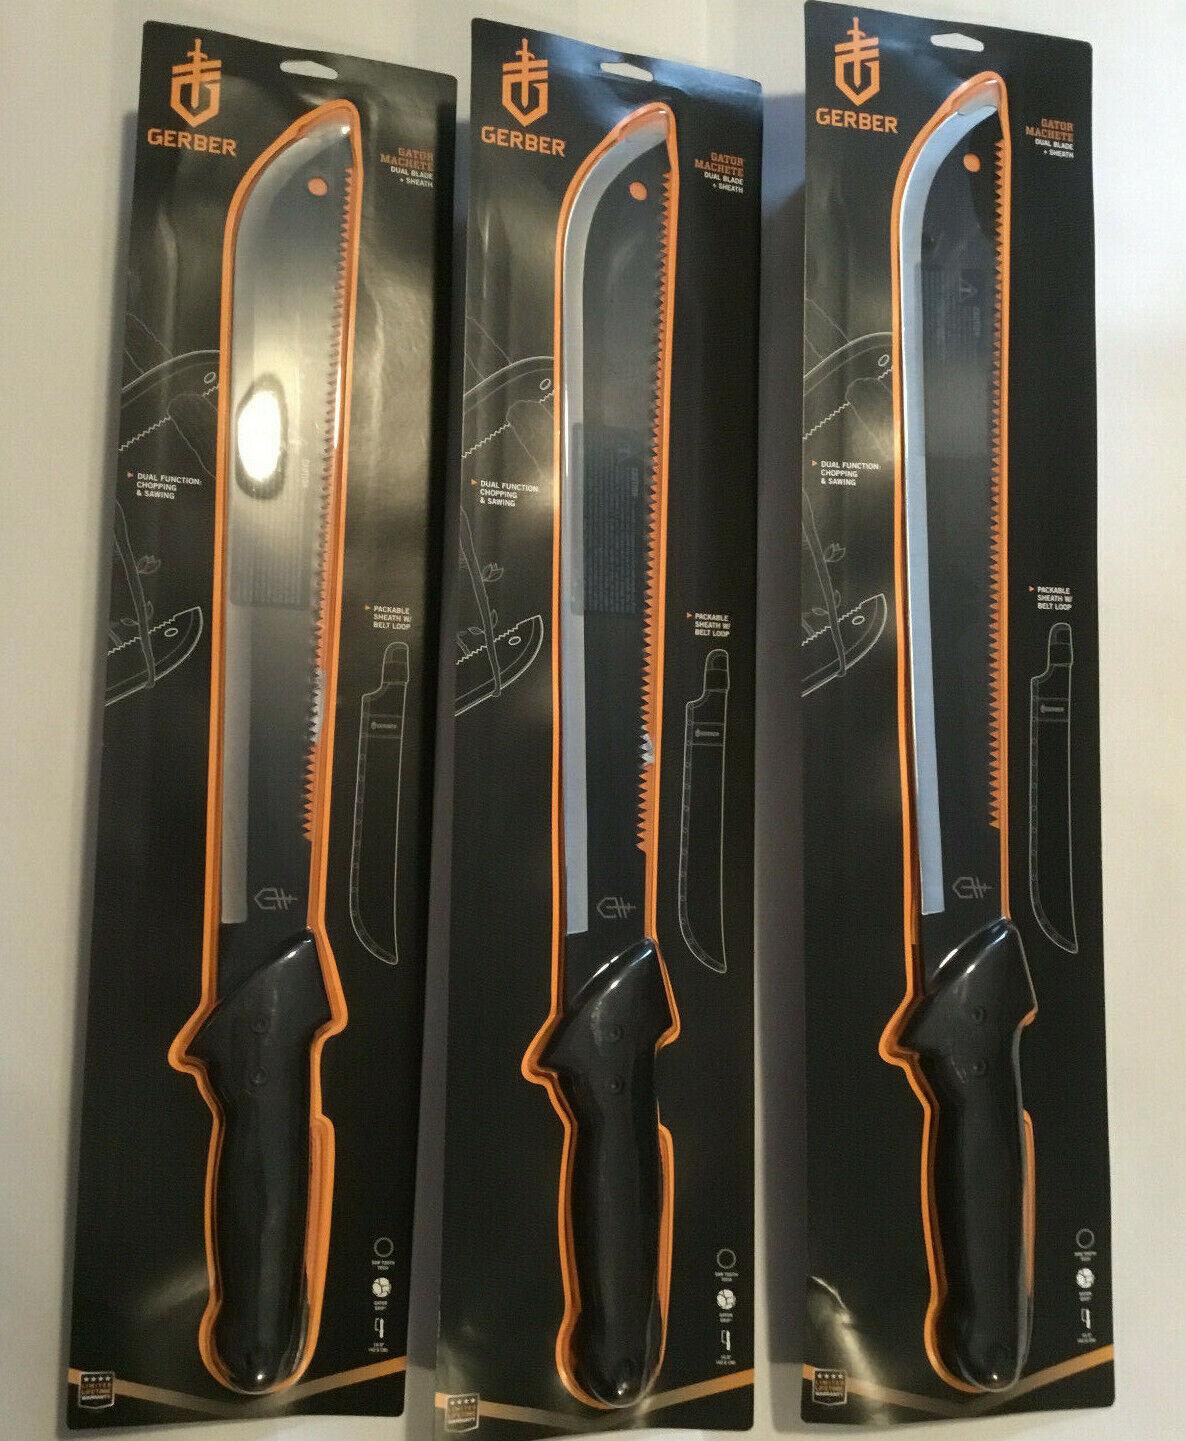 3 - Gerber  Gator Machete Dual Blade & Sheath 31-000758  fishional store for sale